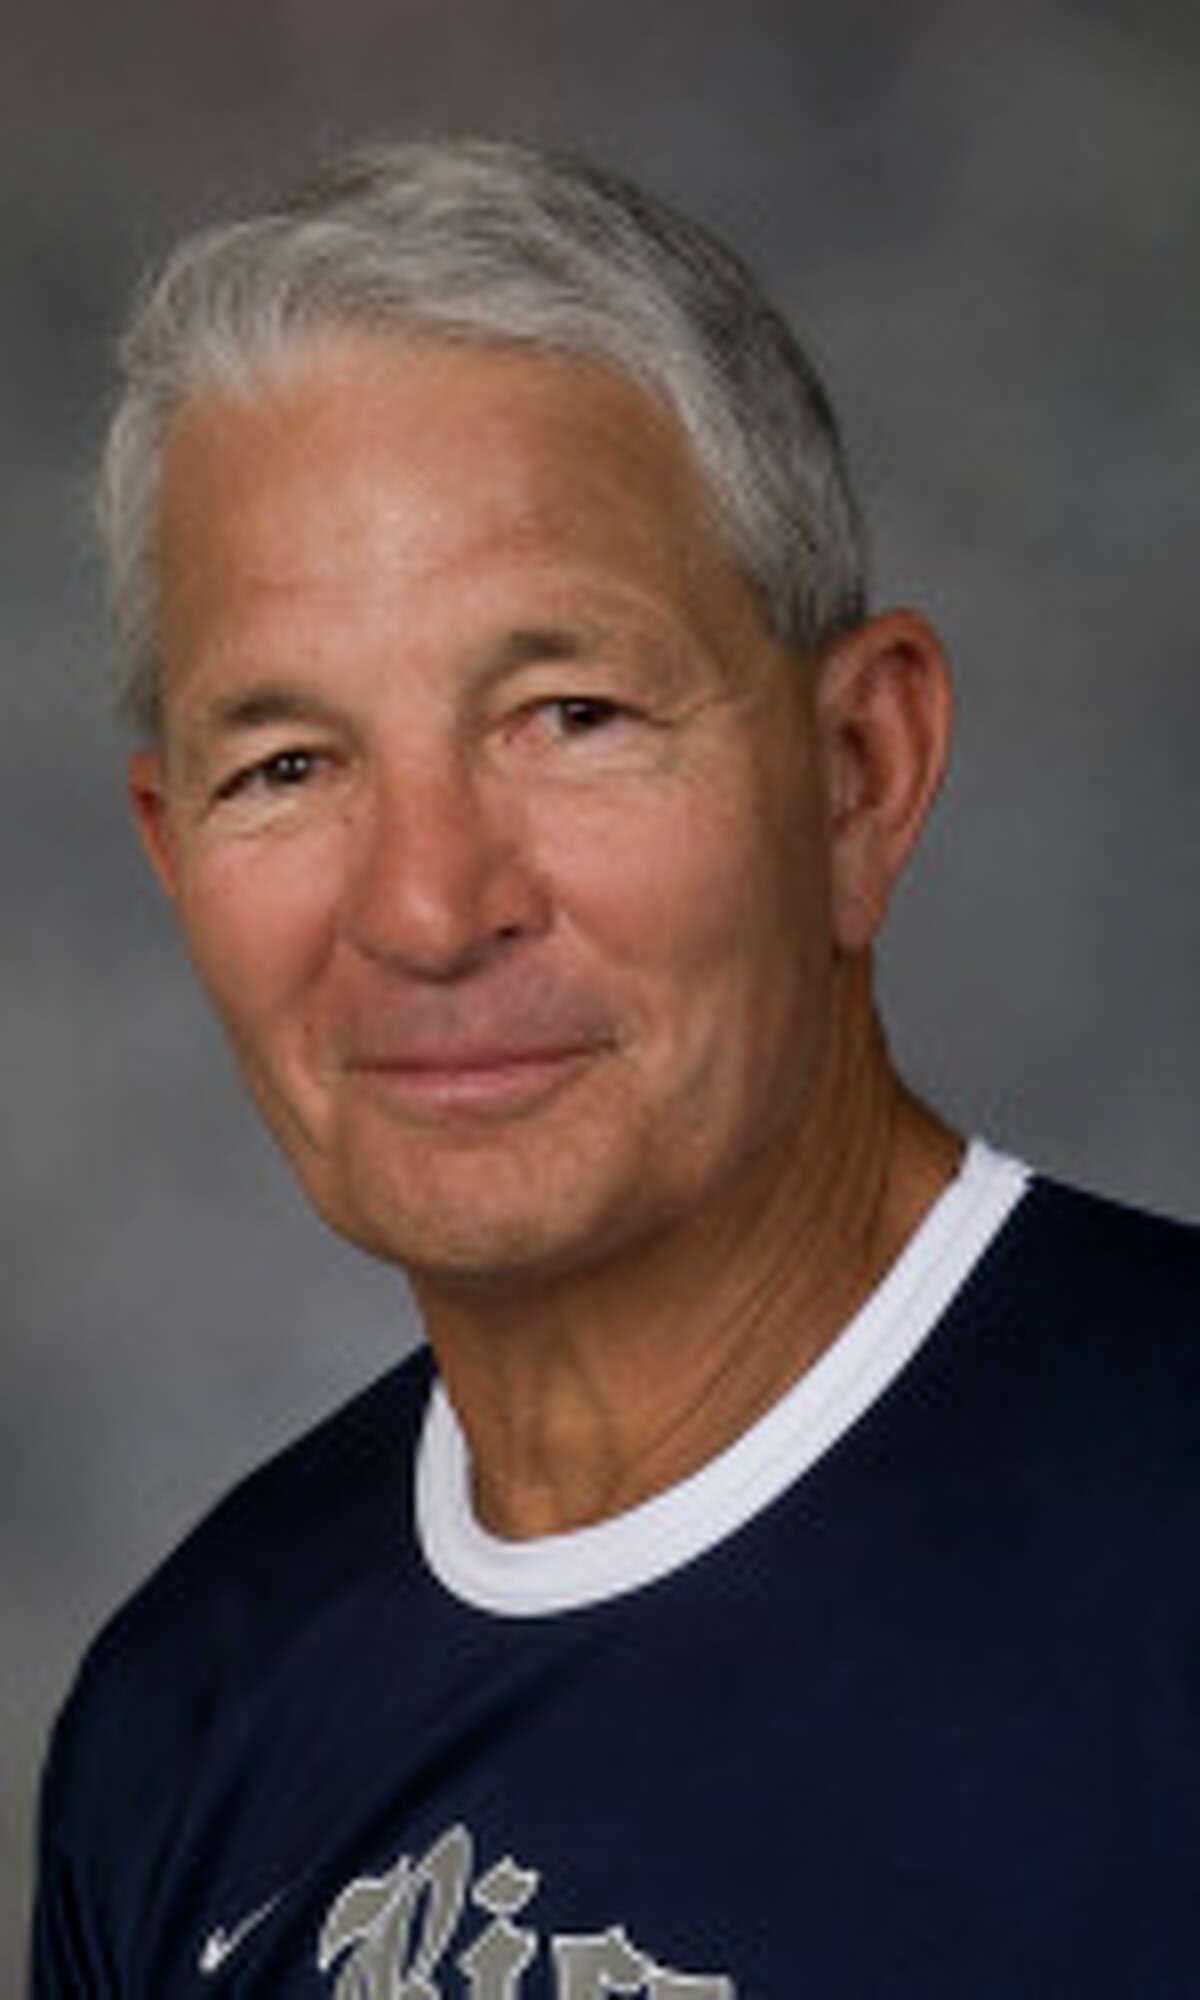 Ron Smarr Rice University tennis coach 2011 school photo